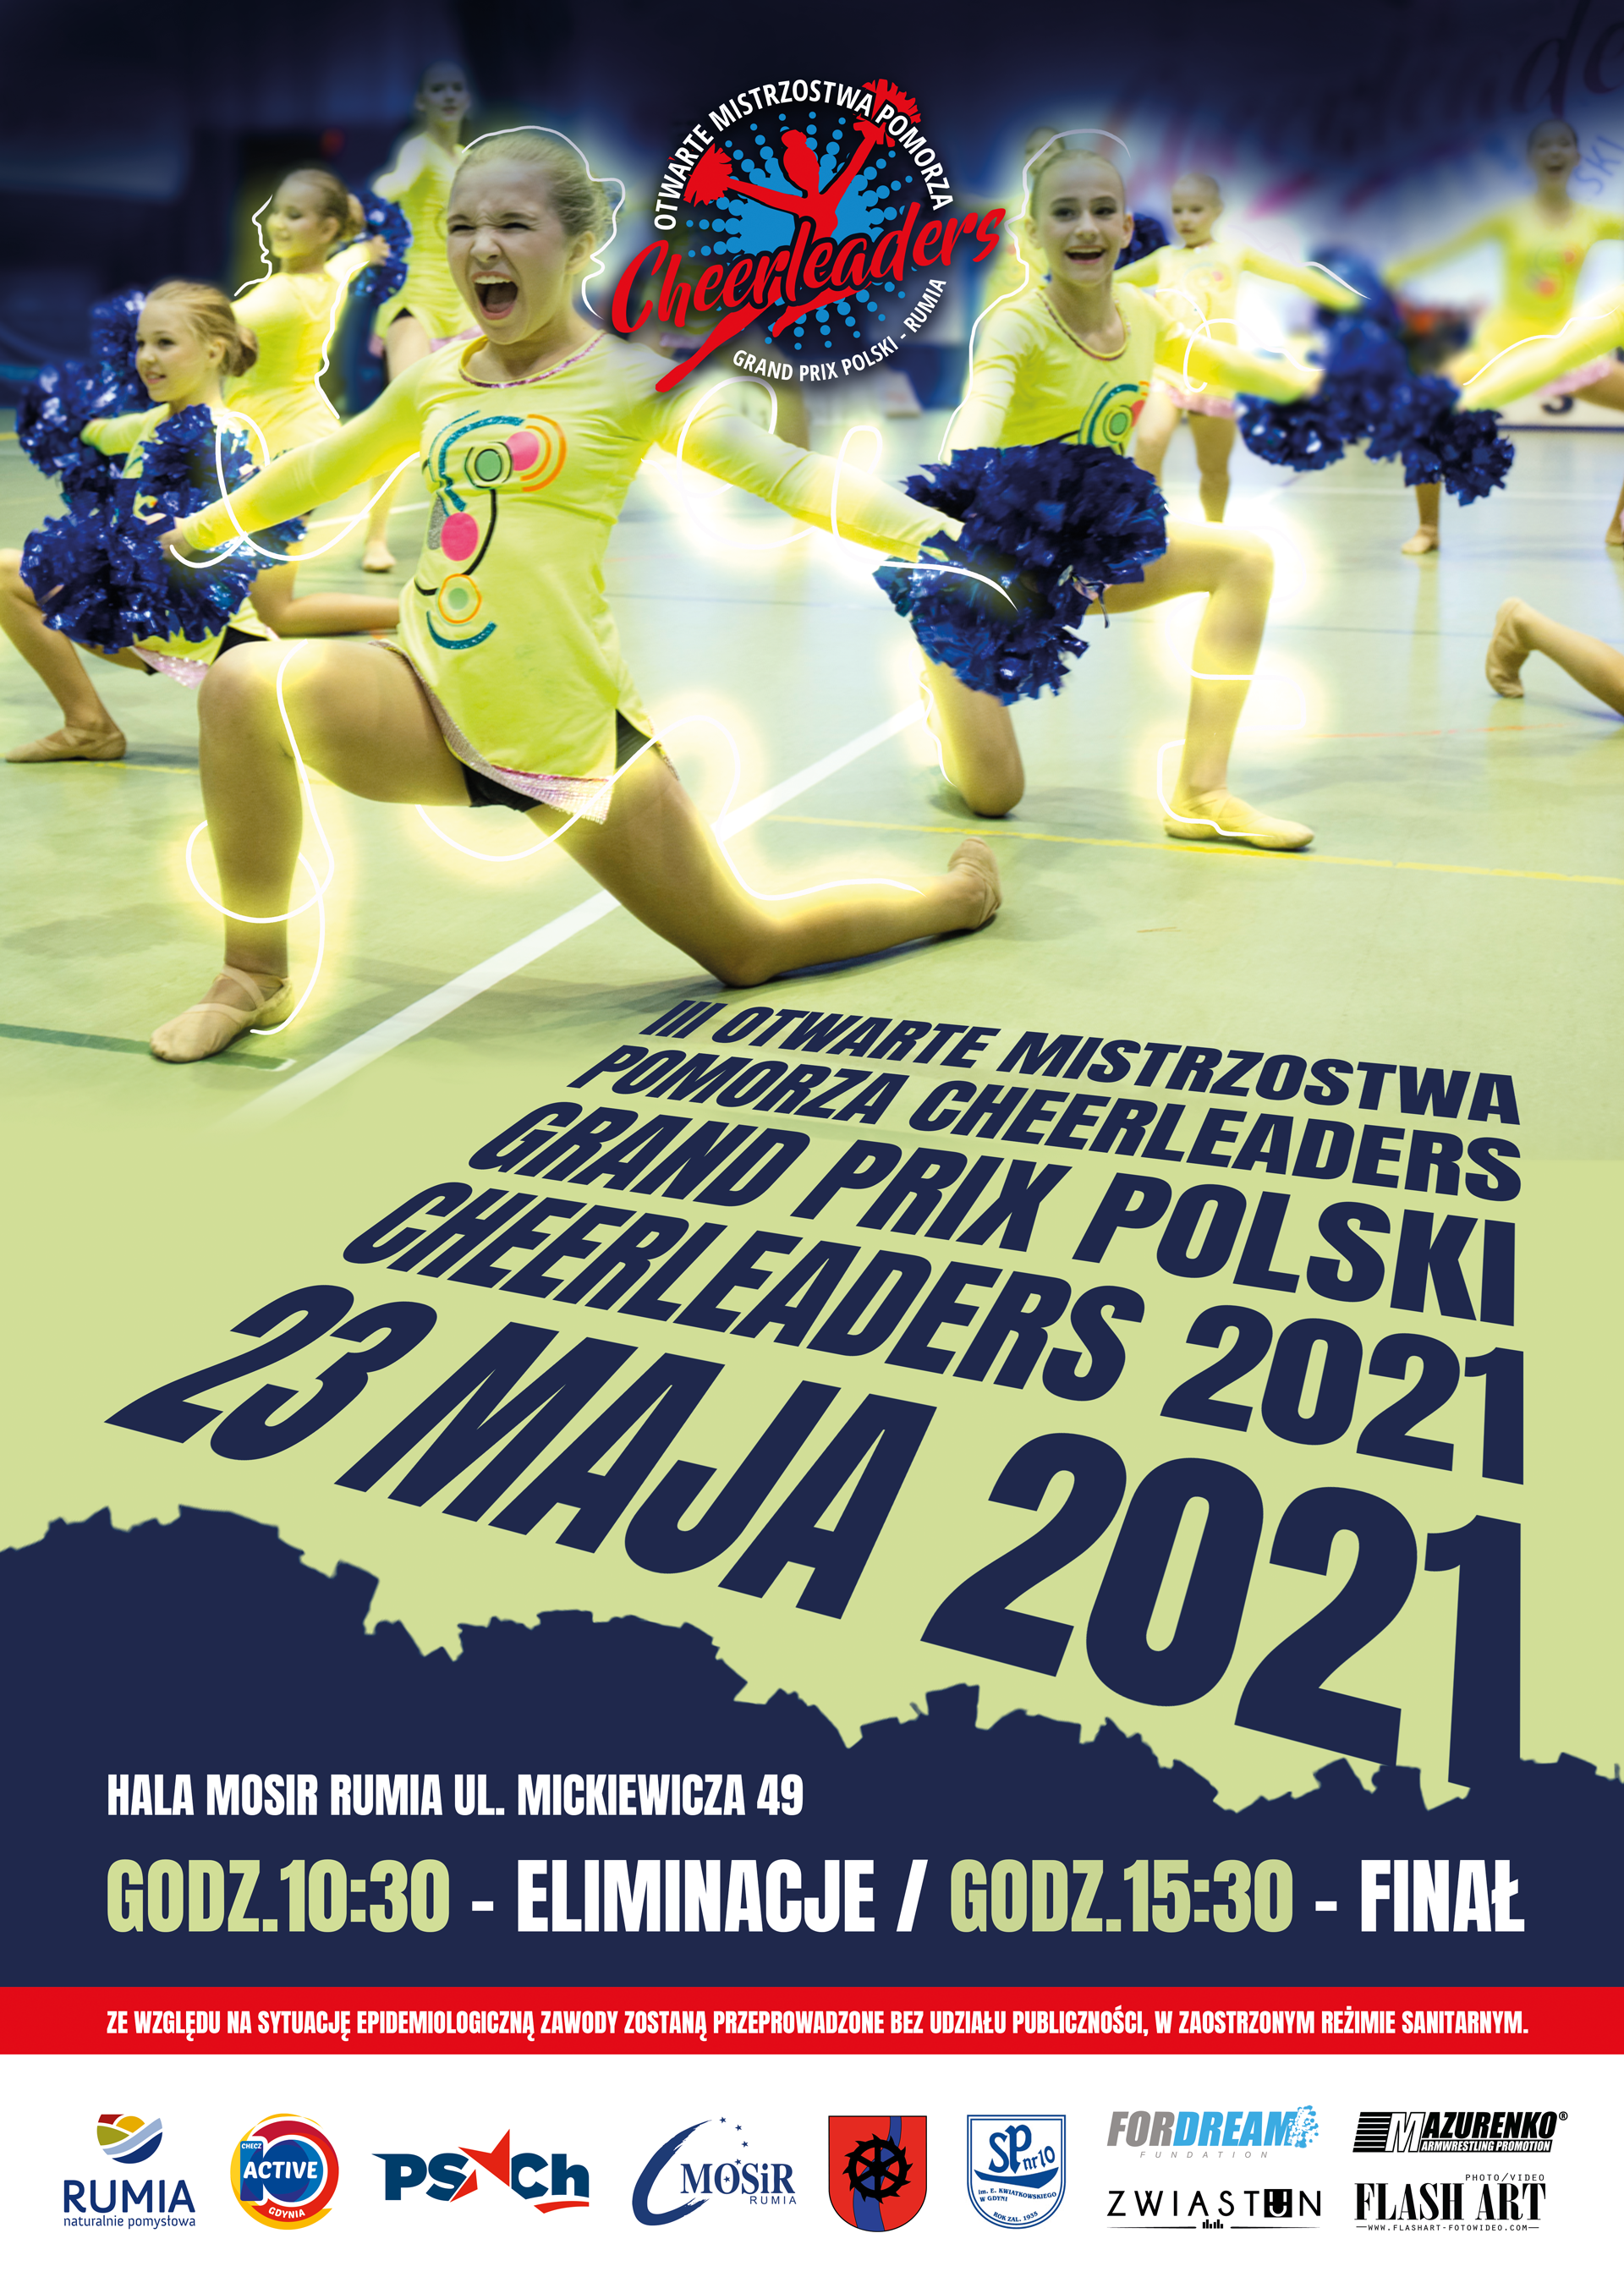 Cheerleaders2021_A2_v2_splszcz_loga